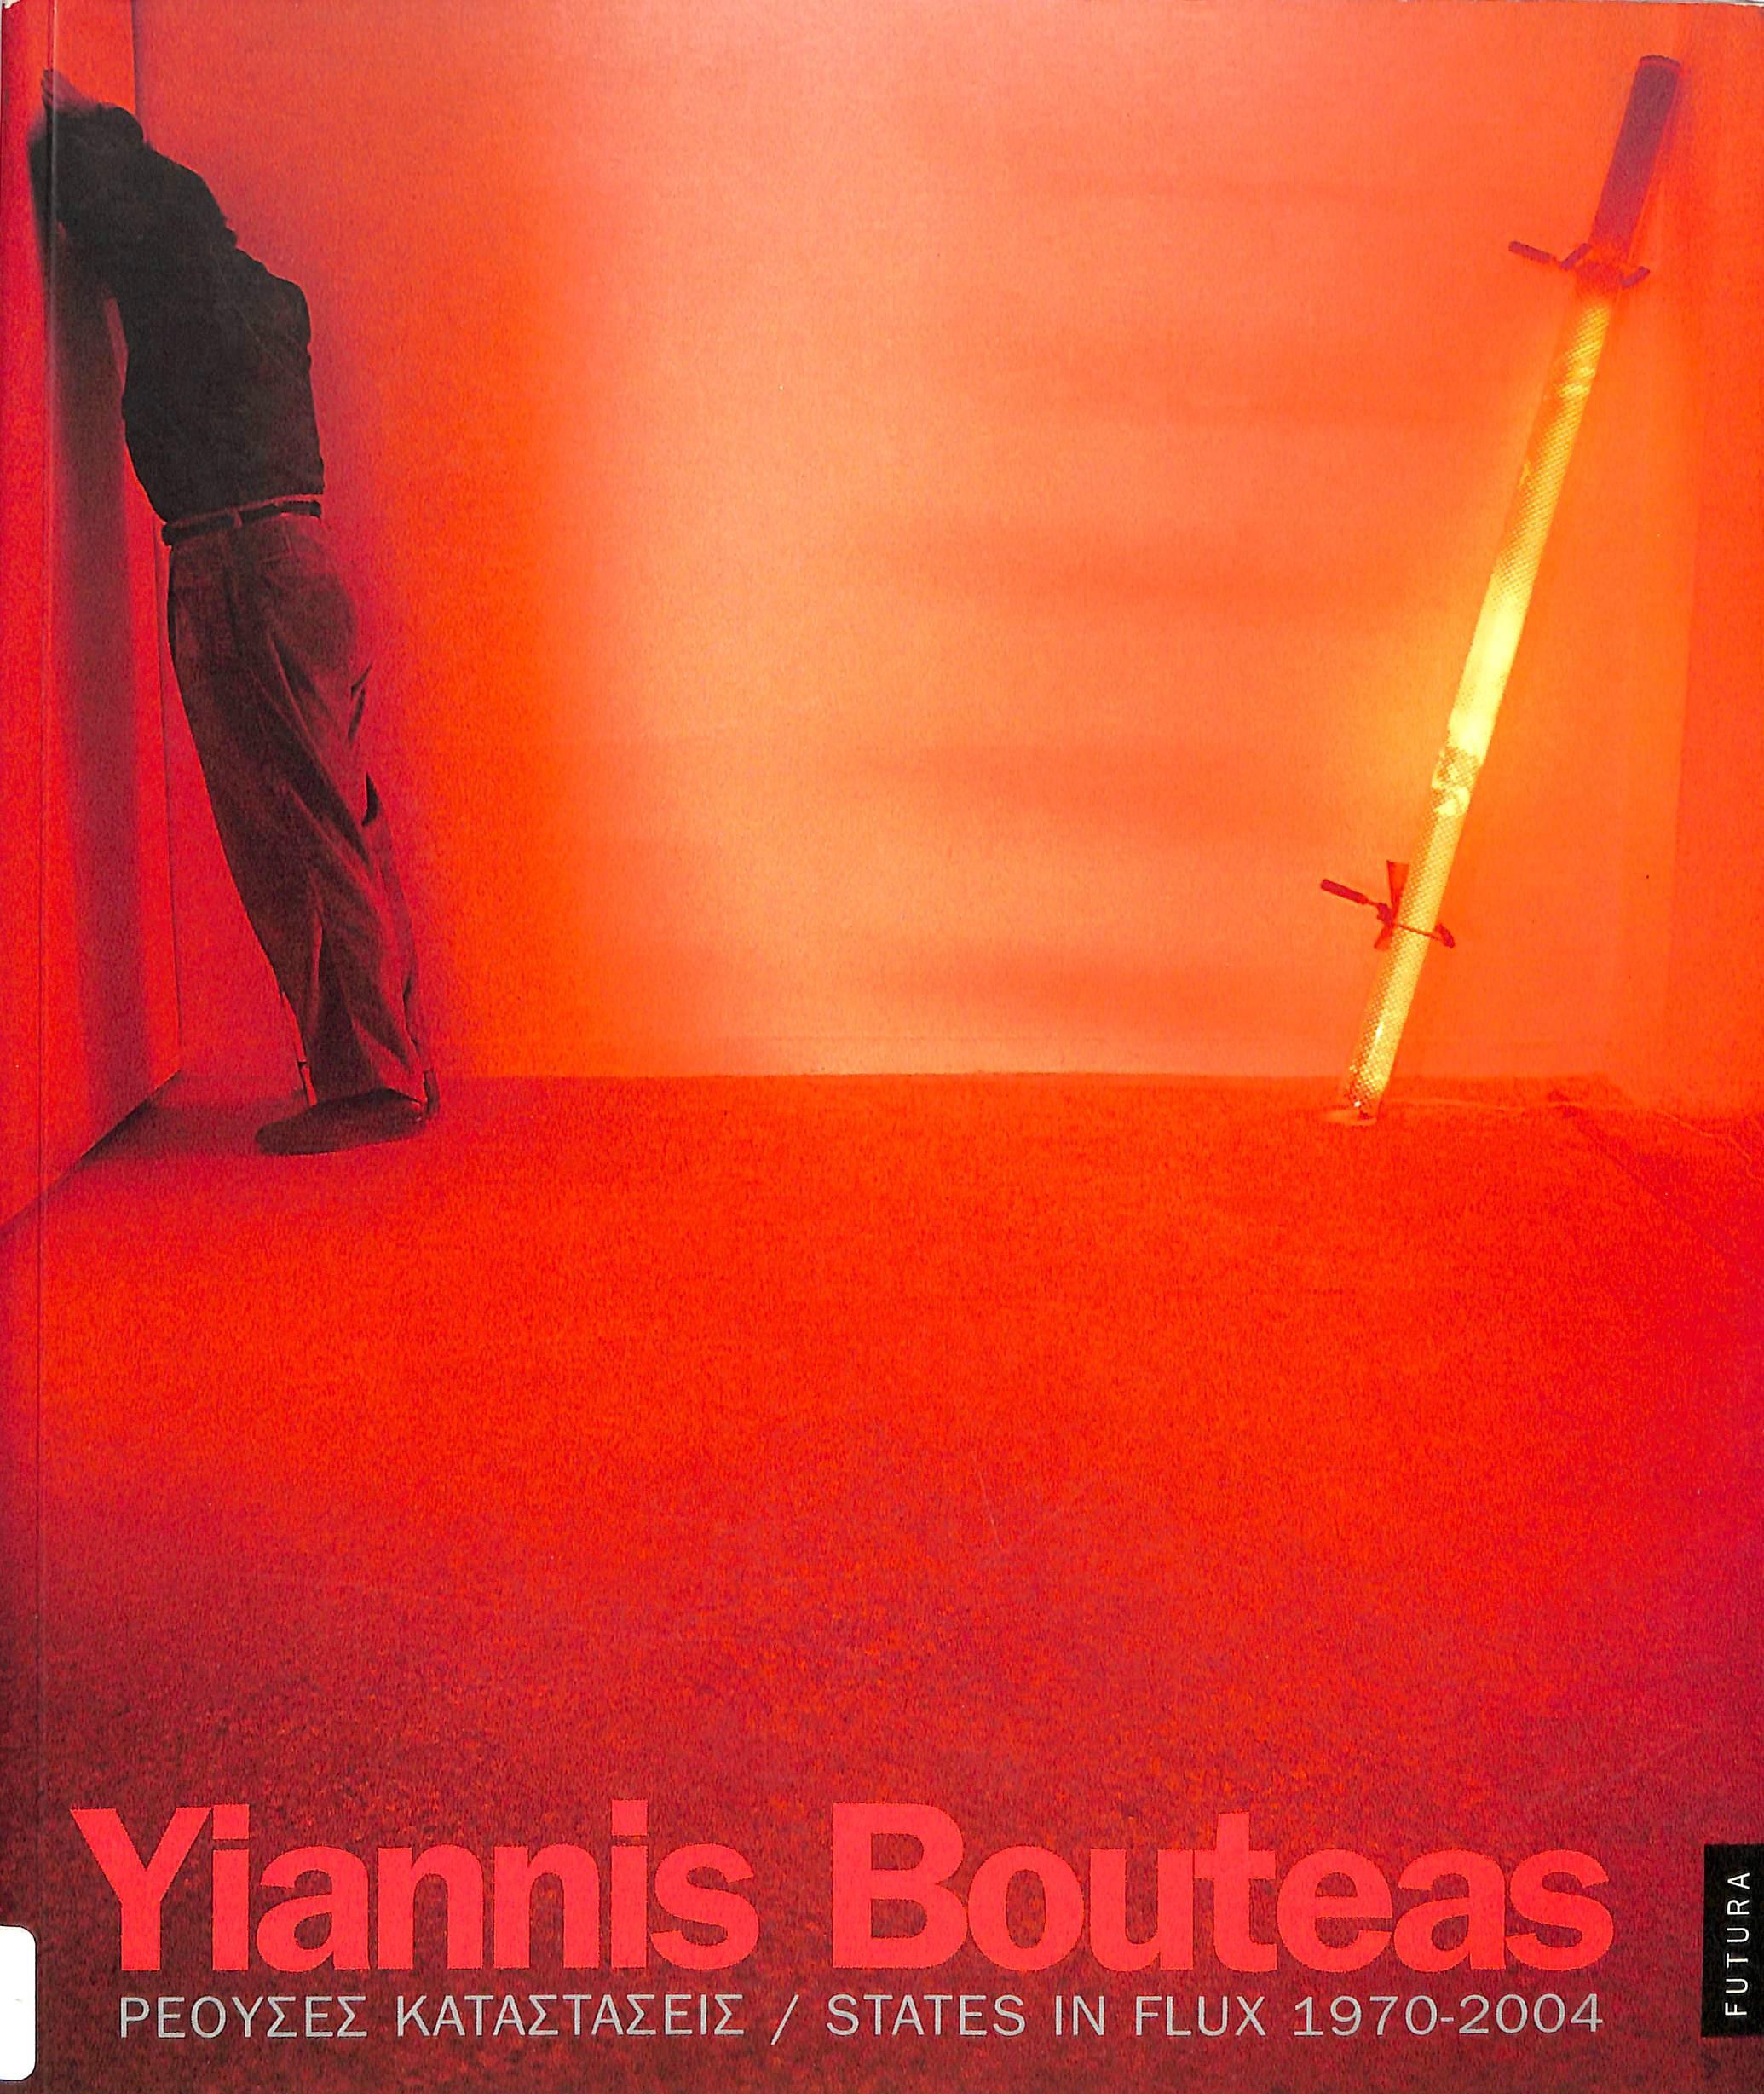 Yiannis Bouteas: ρέουσες καταστάσεις 1970-2004, Αθήνα: Futura, 2004